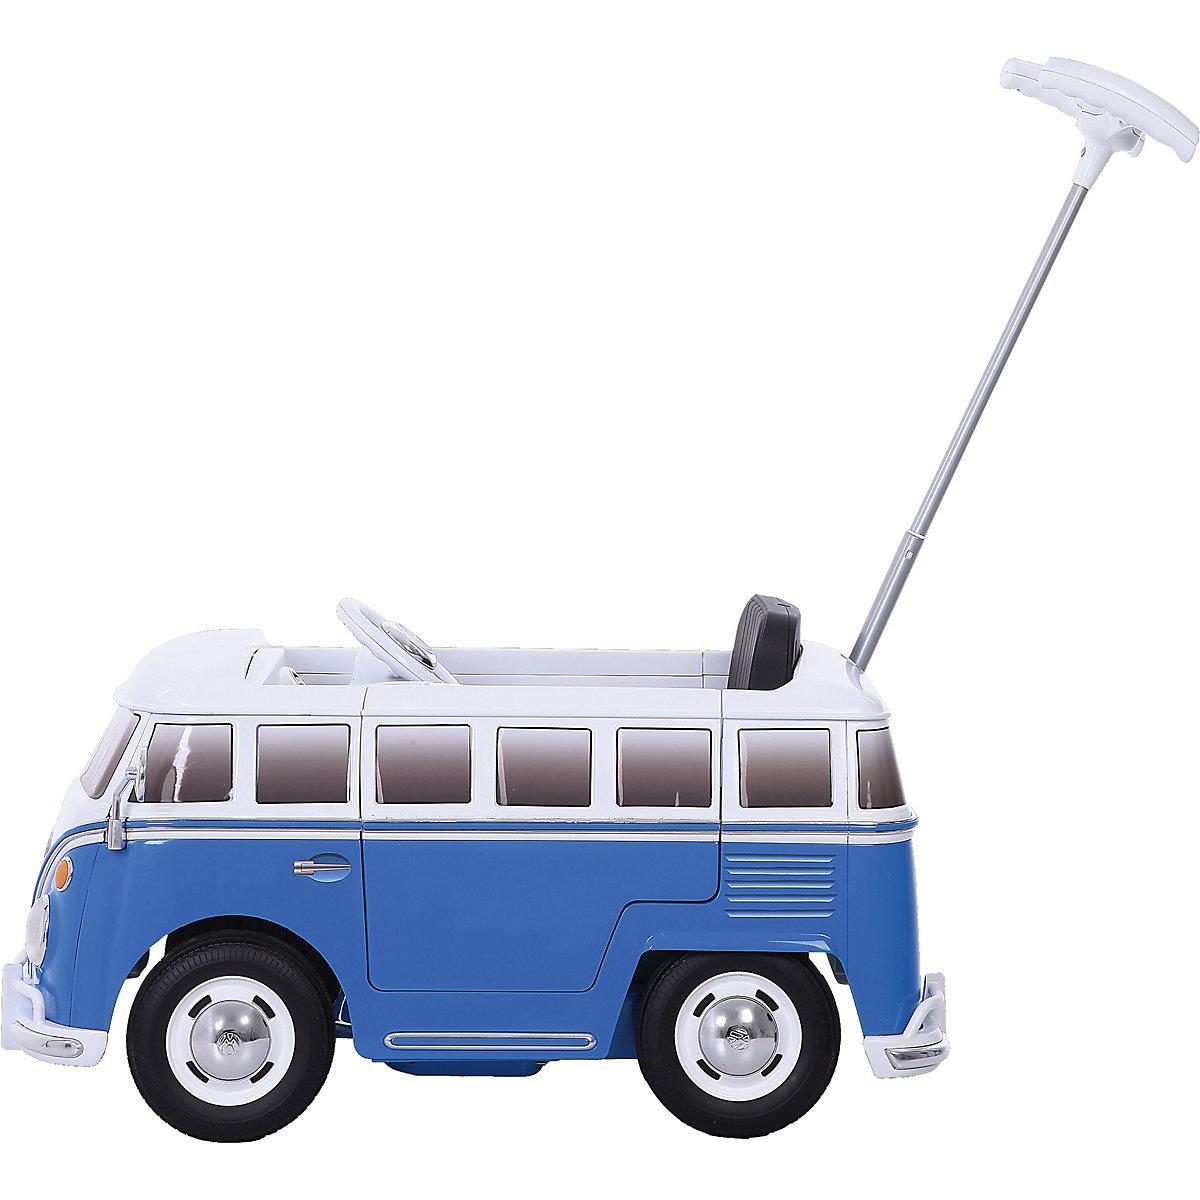 vw bus t2 push car blau rollplay mytoys. Black Bedroom Furniture Sets. Home Design Ideas